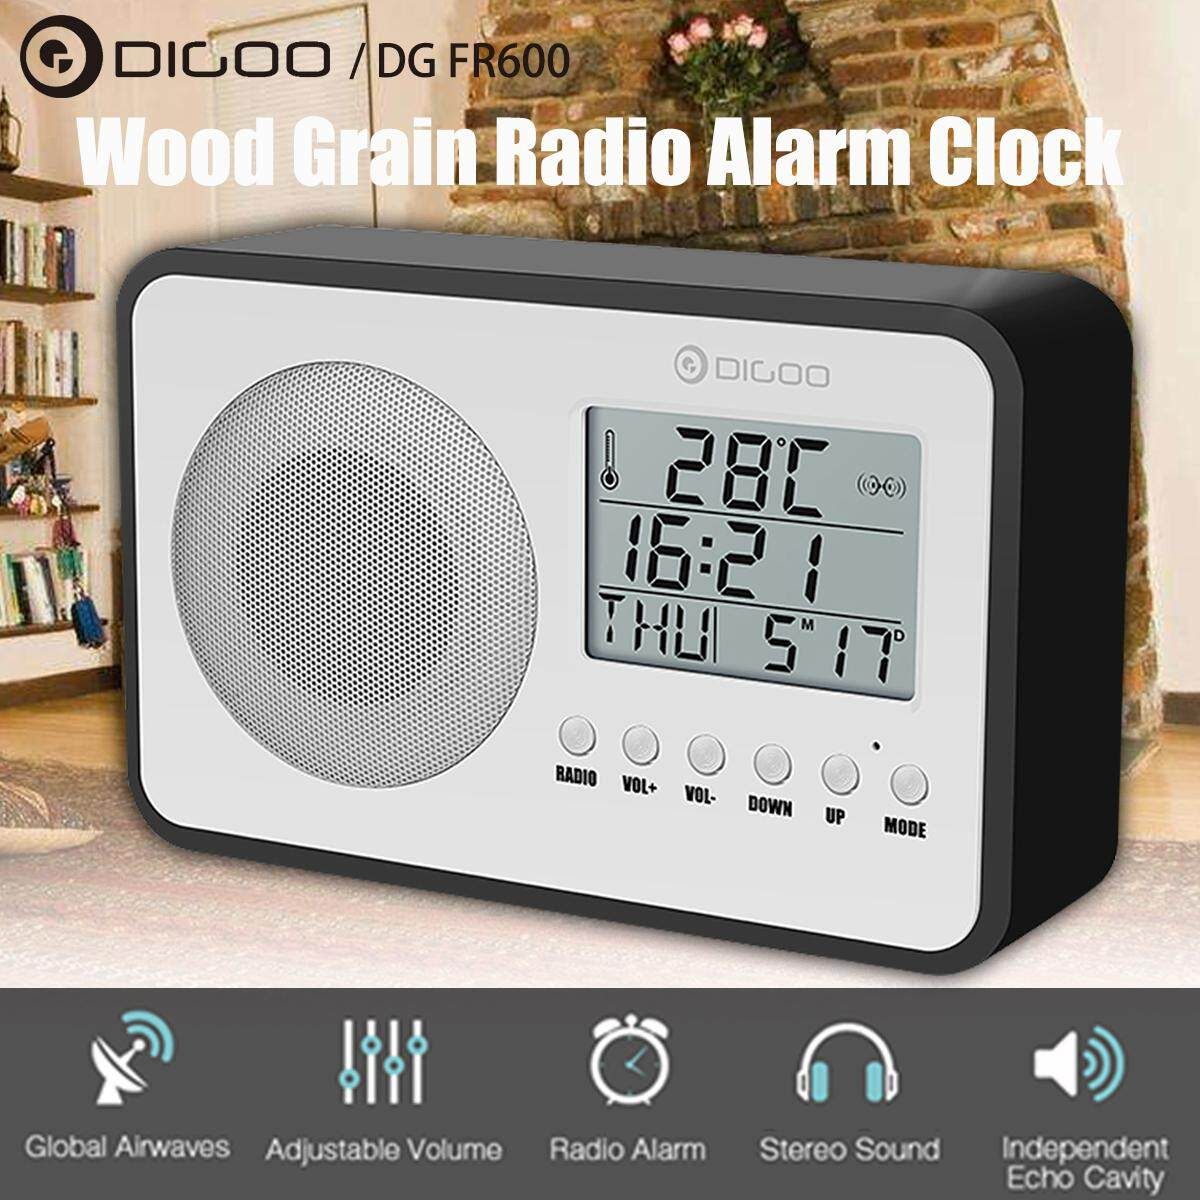 Digoo DG FR600 SmartSet Wireless Wood Grain Vintage Digital FM Radio Alarm Clock Subwoofer Sound with Temperature Display